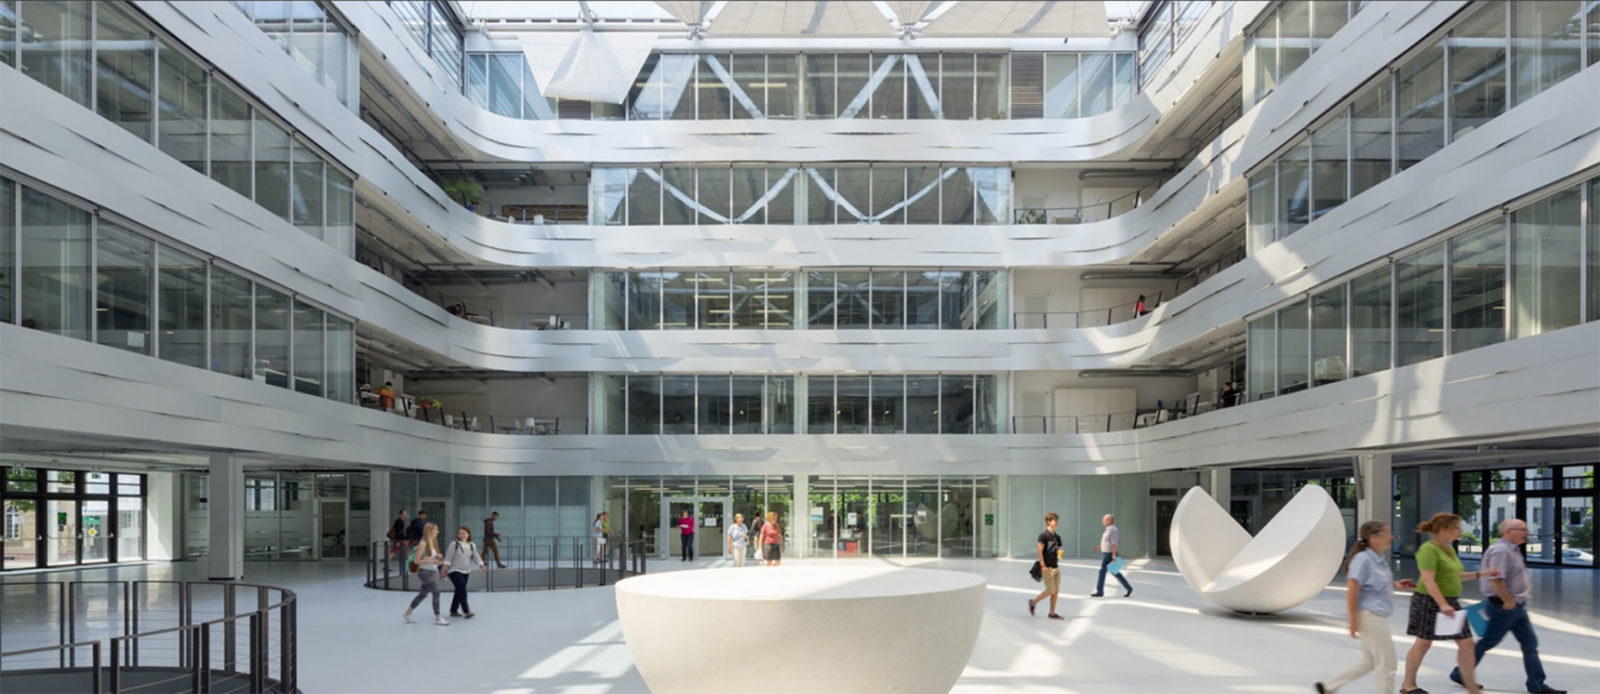 Institute of Mathematics, University of Karlsruhe